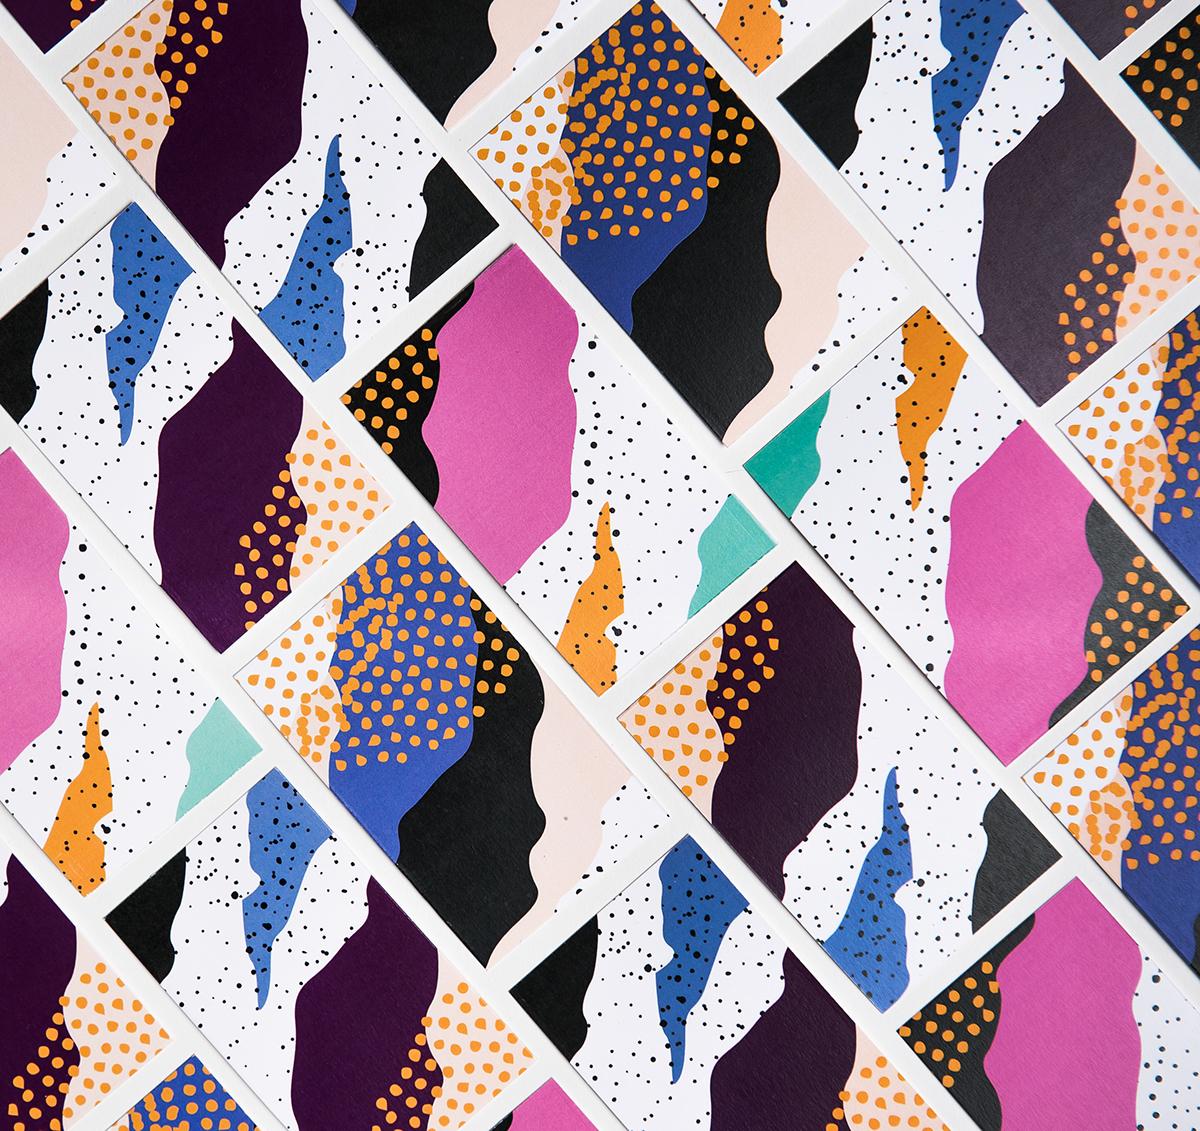 Sweden mochiice icecream package design Nordic Design print pattern take away